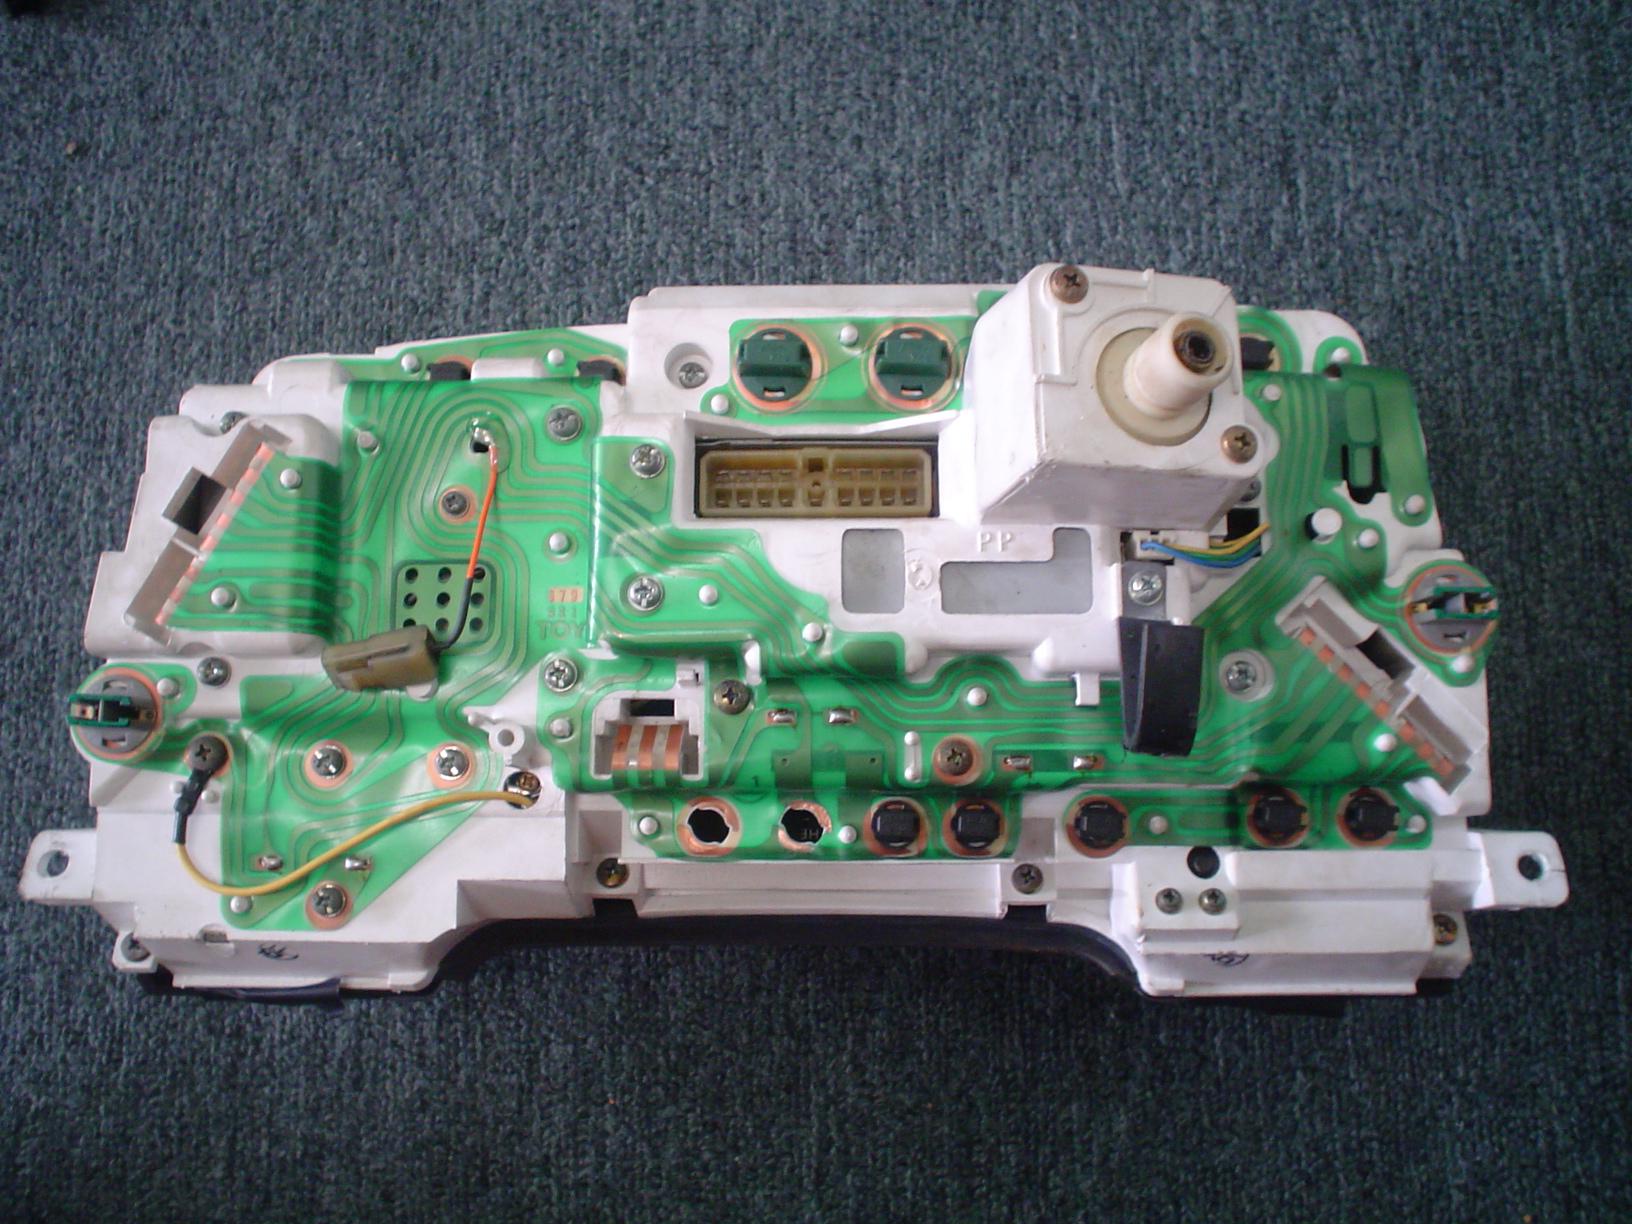 toyota check engine light symbols toyota engine problems. Black Bedroom Furniture Sets. Home Design Ideas